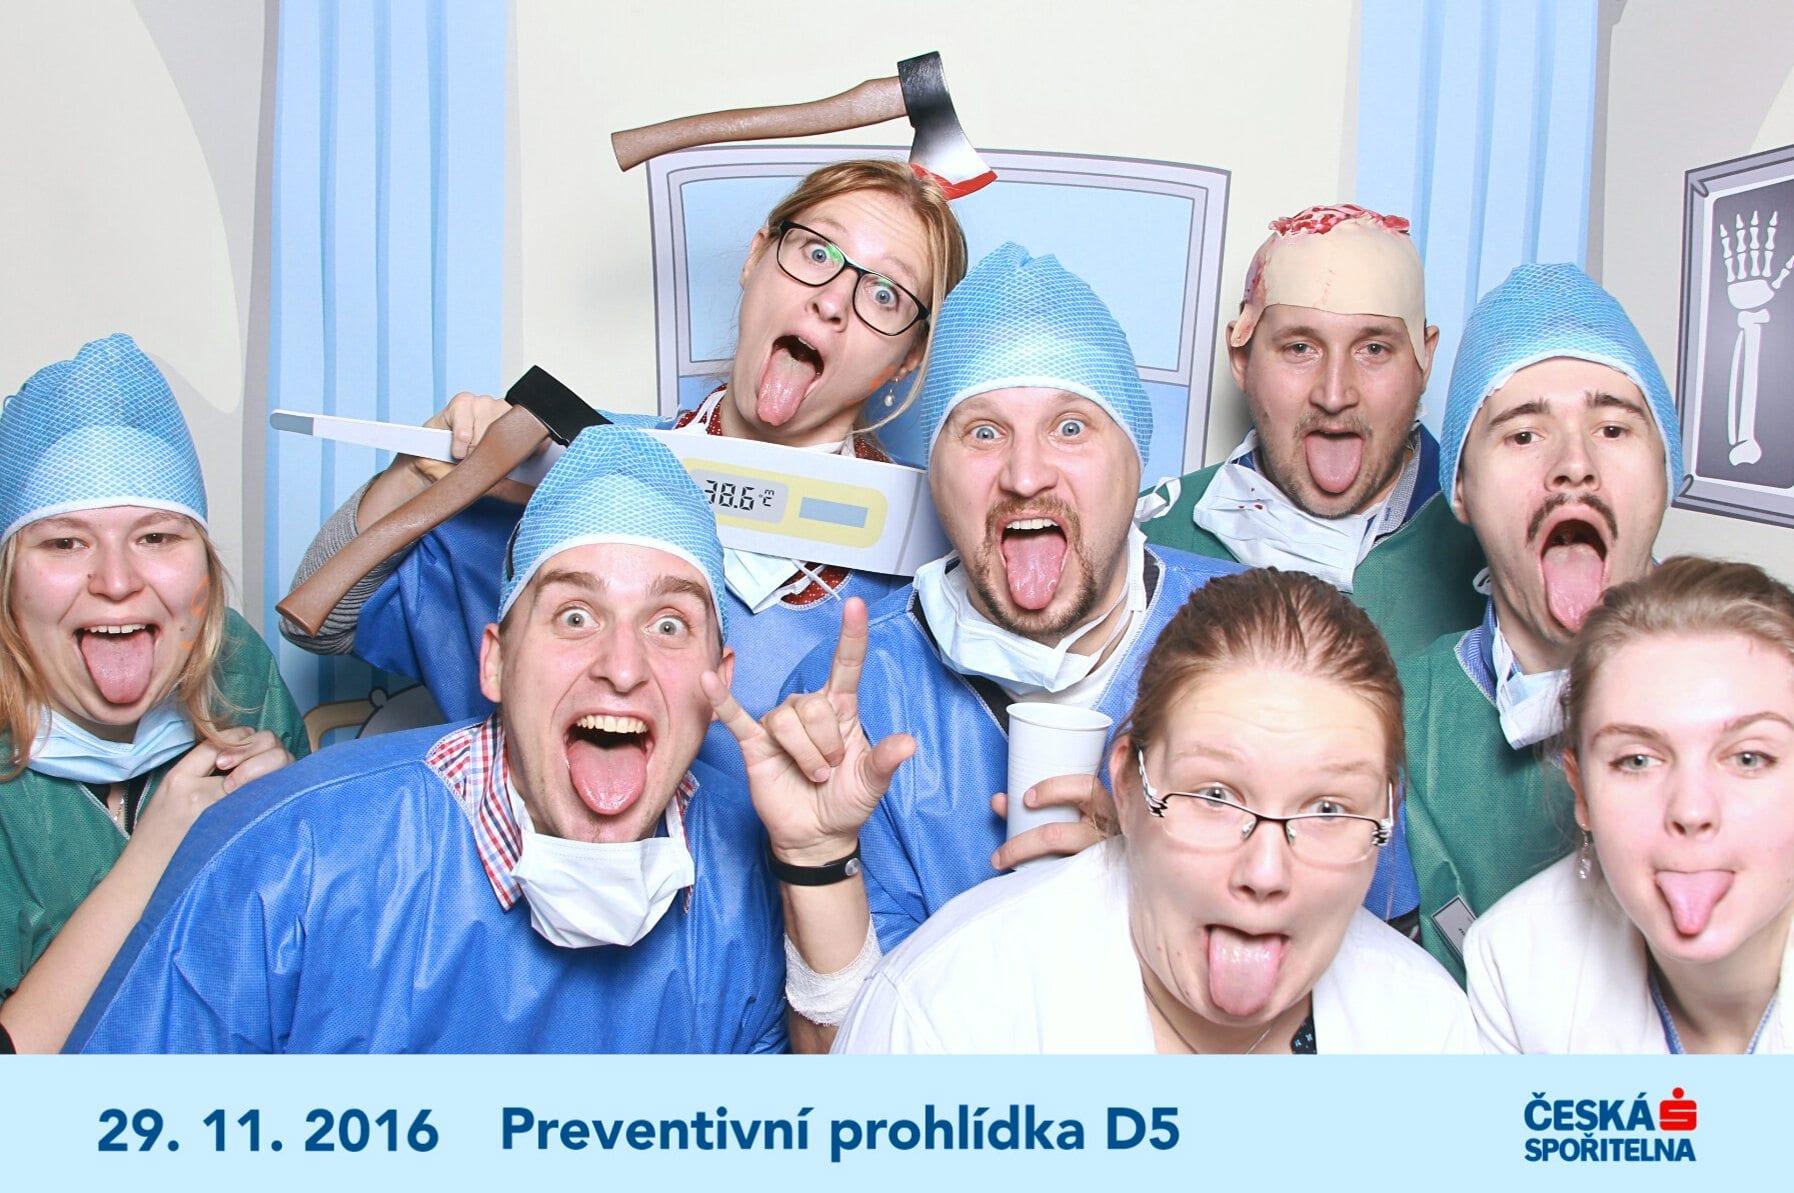 fotokoutek-ceska-sporitelna-preventivni-prohlidka-d5-166407